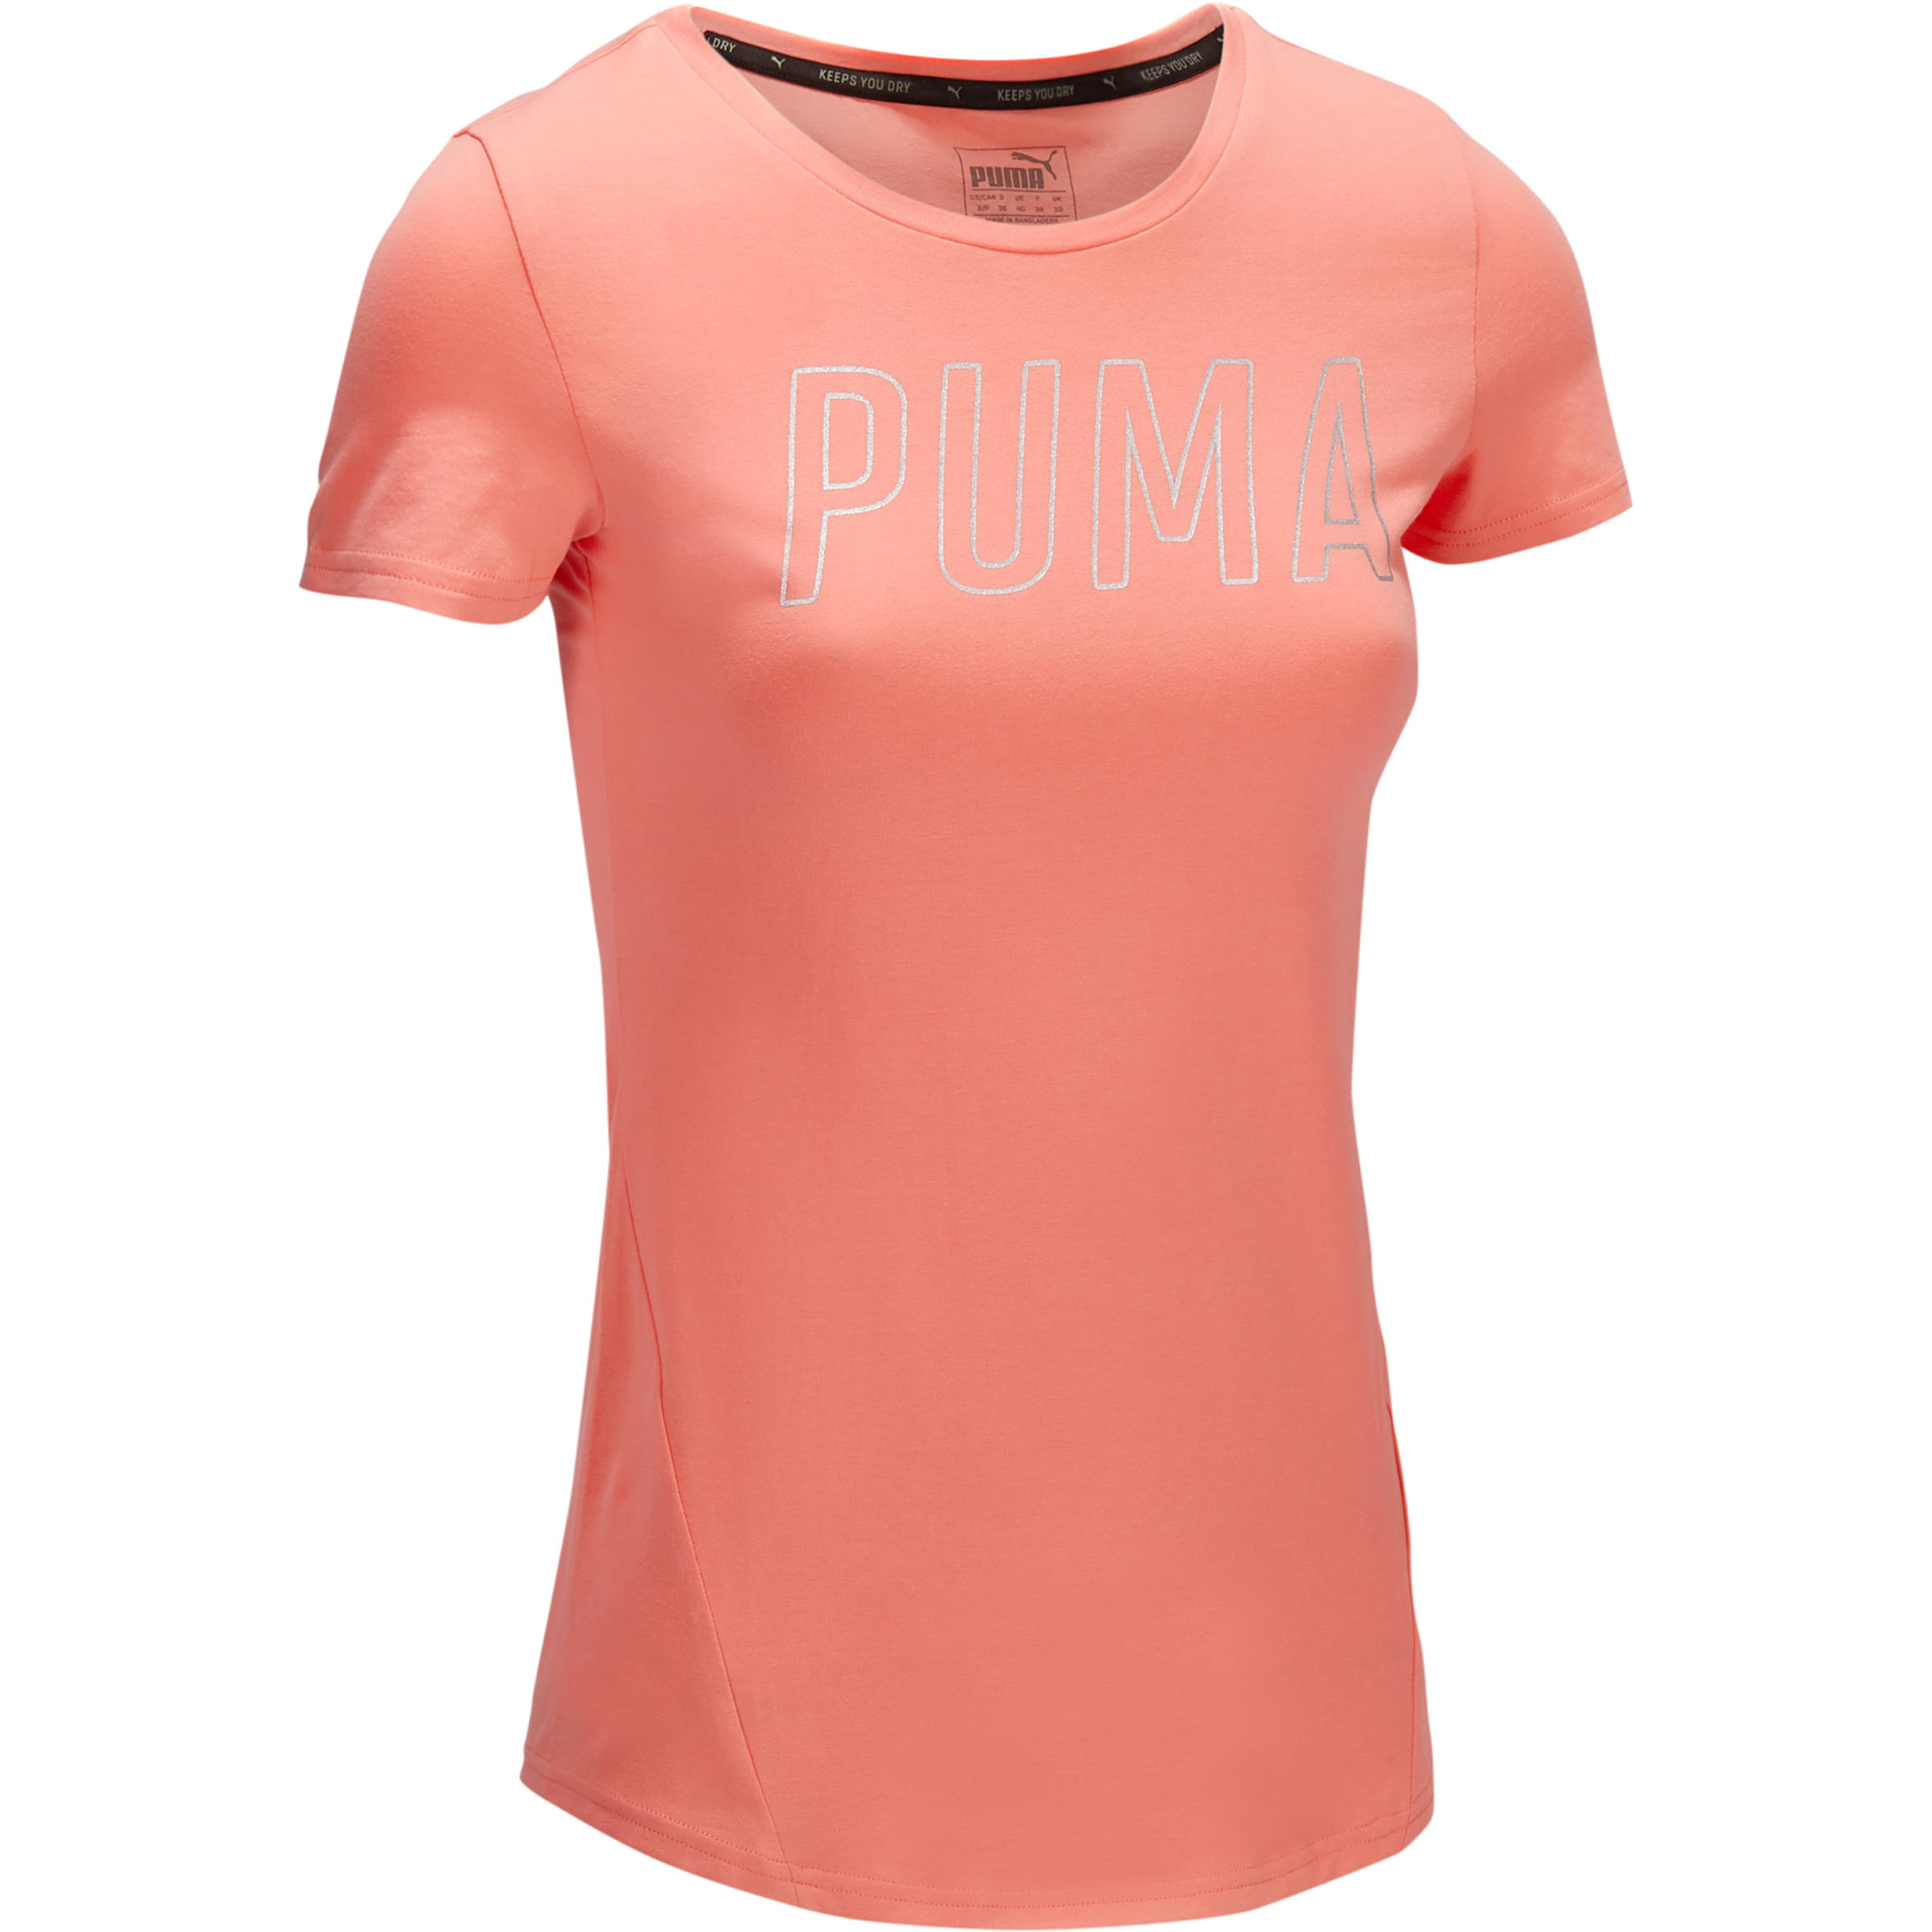 Puma Dames T-shirt Puma voor gym en pilates koraal